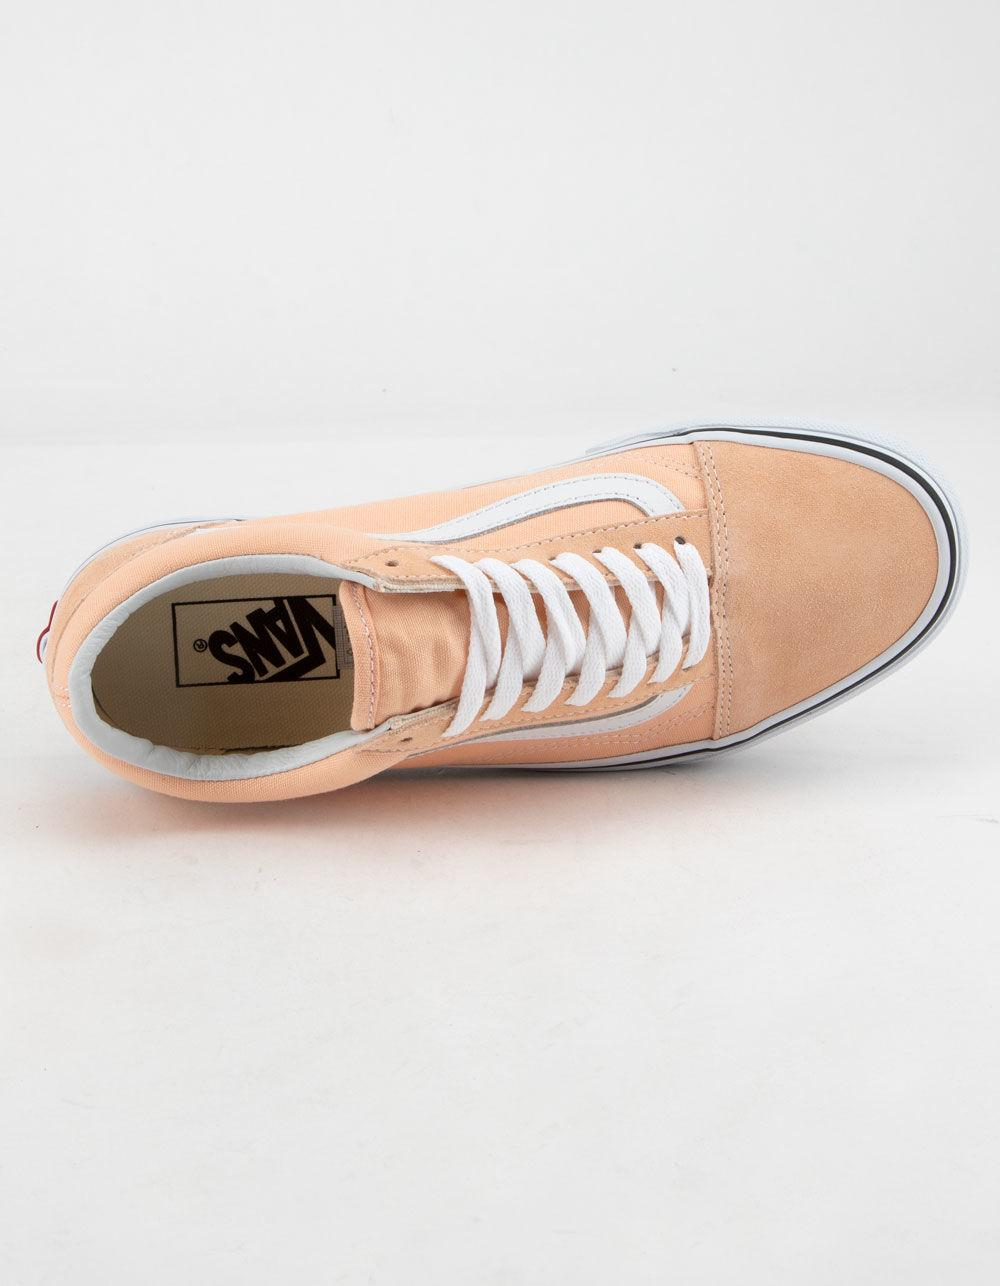 f91f466829b6 Vans - Pink Old Skool Bleached Apricot   True White Womens Shoes - Lyst.  View fullscreen